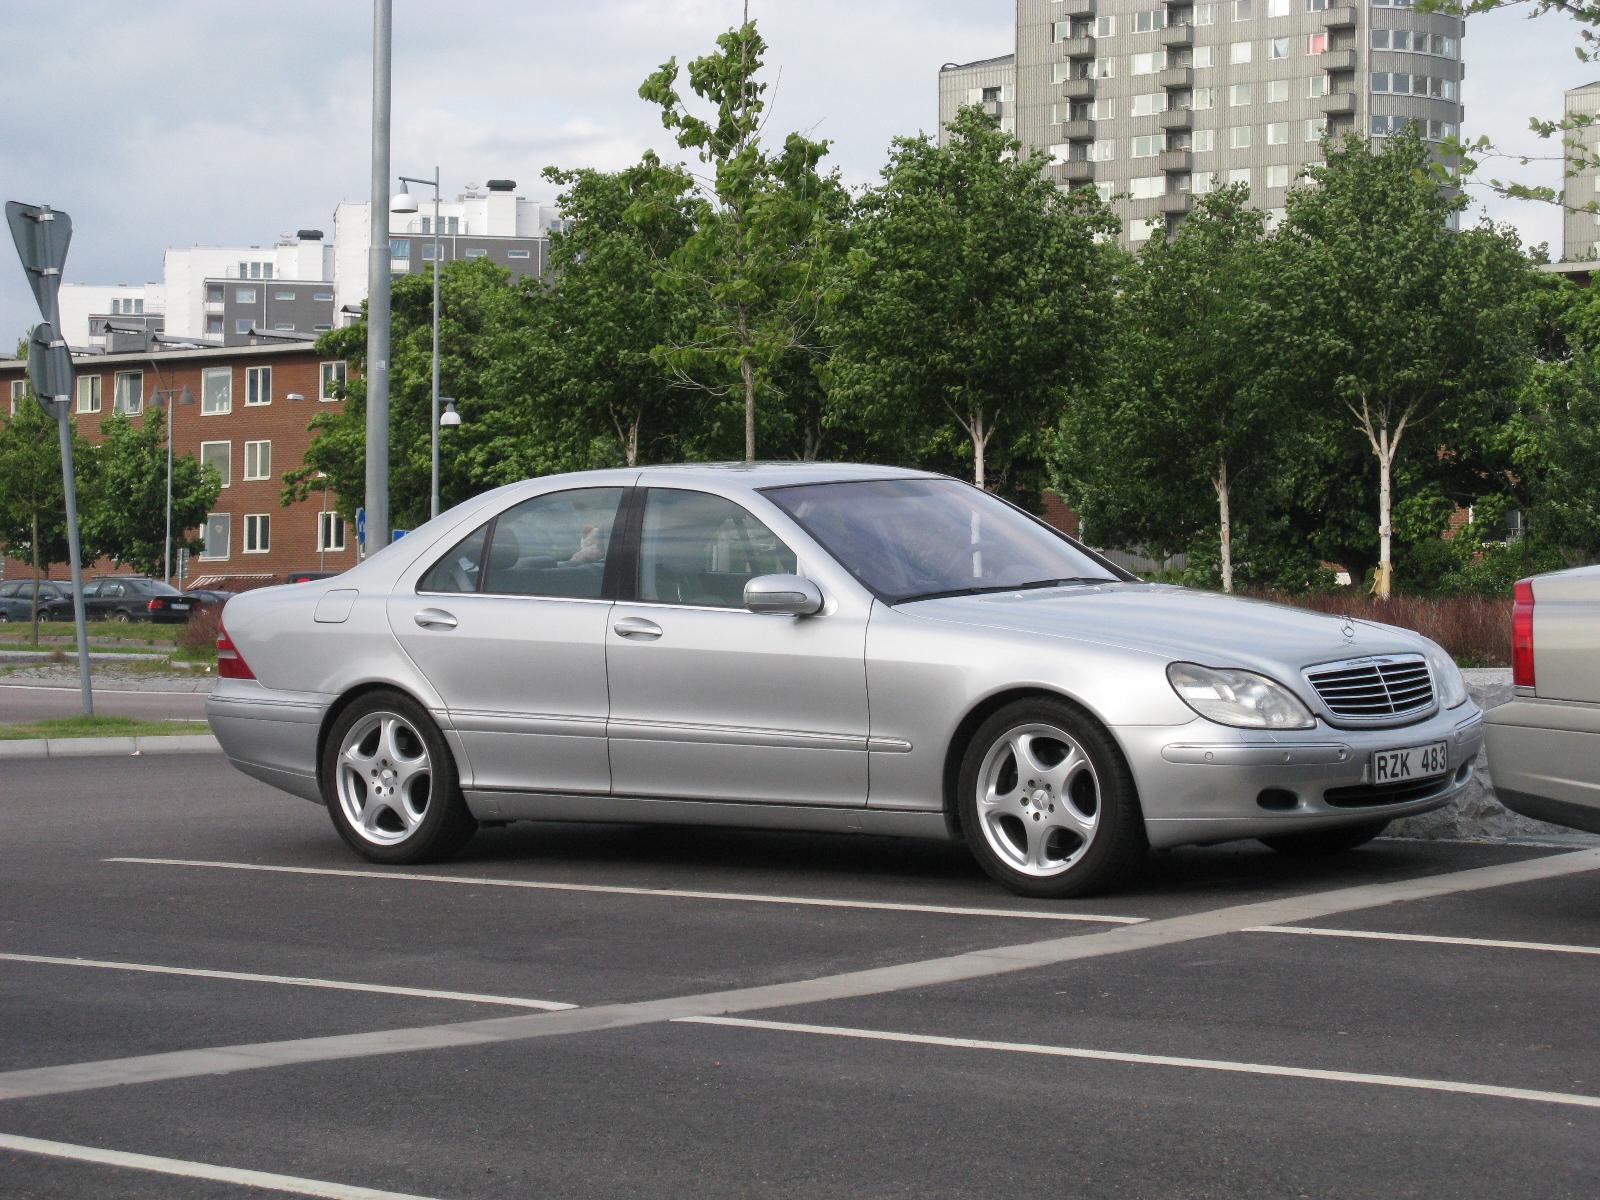 File:Mercedes-Benz S500 W220 (9077989259) jpg - Wikimedia